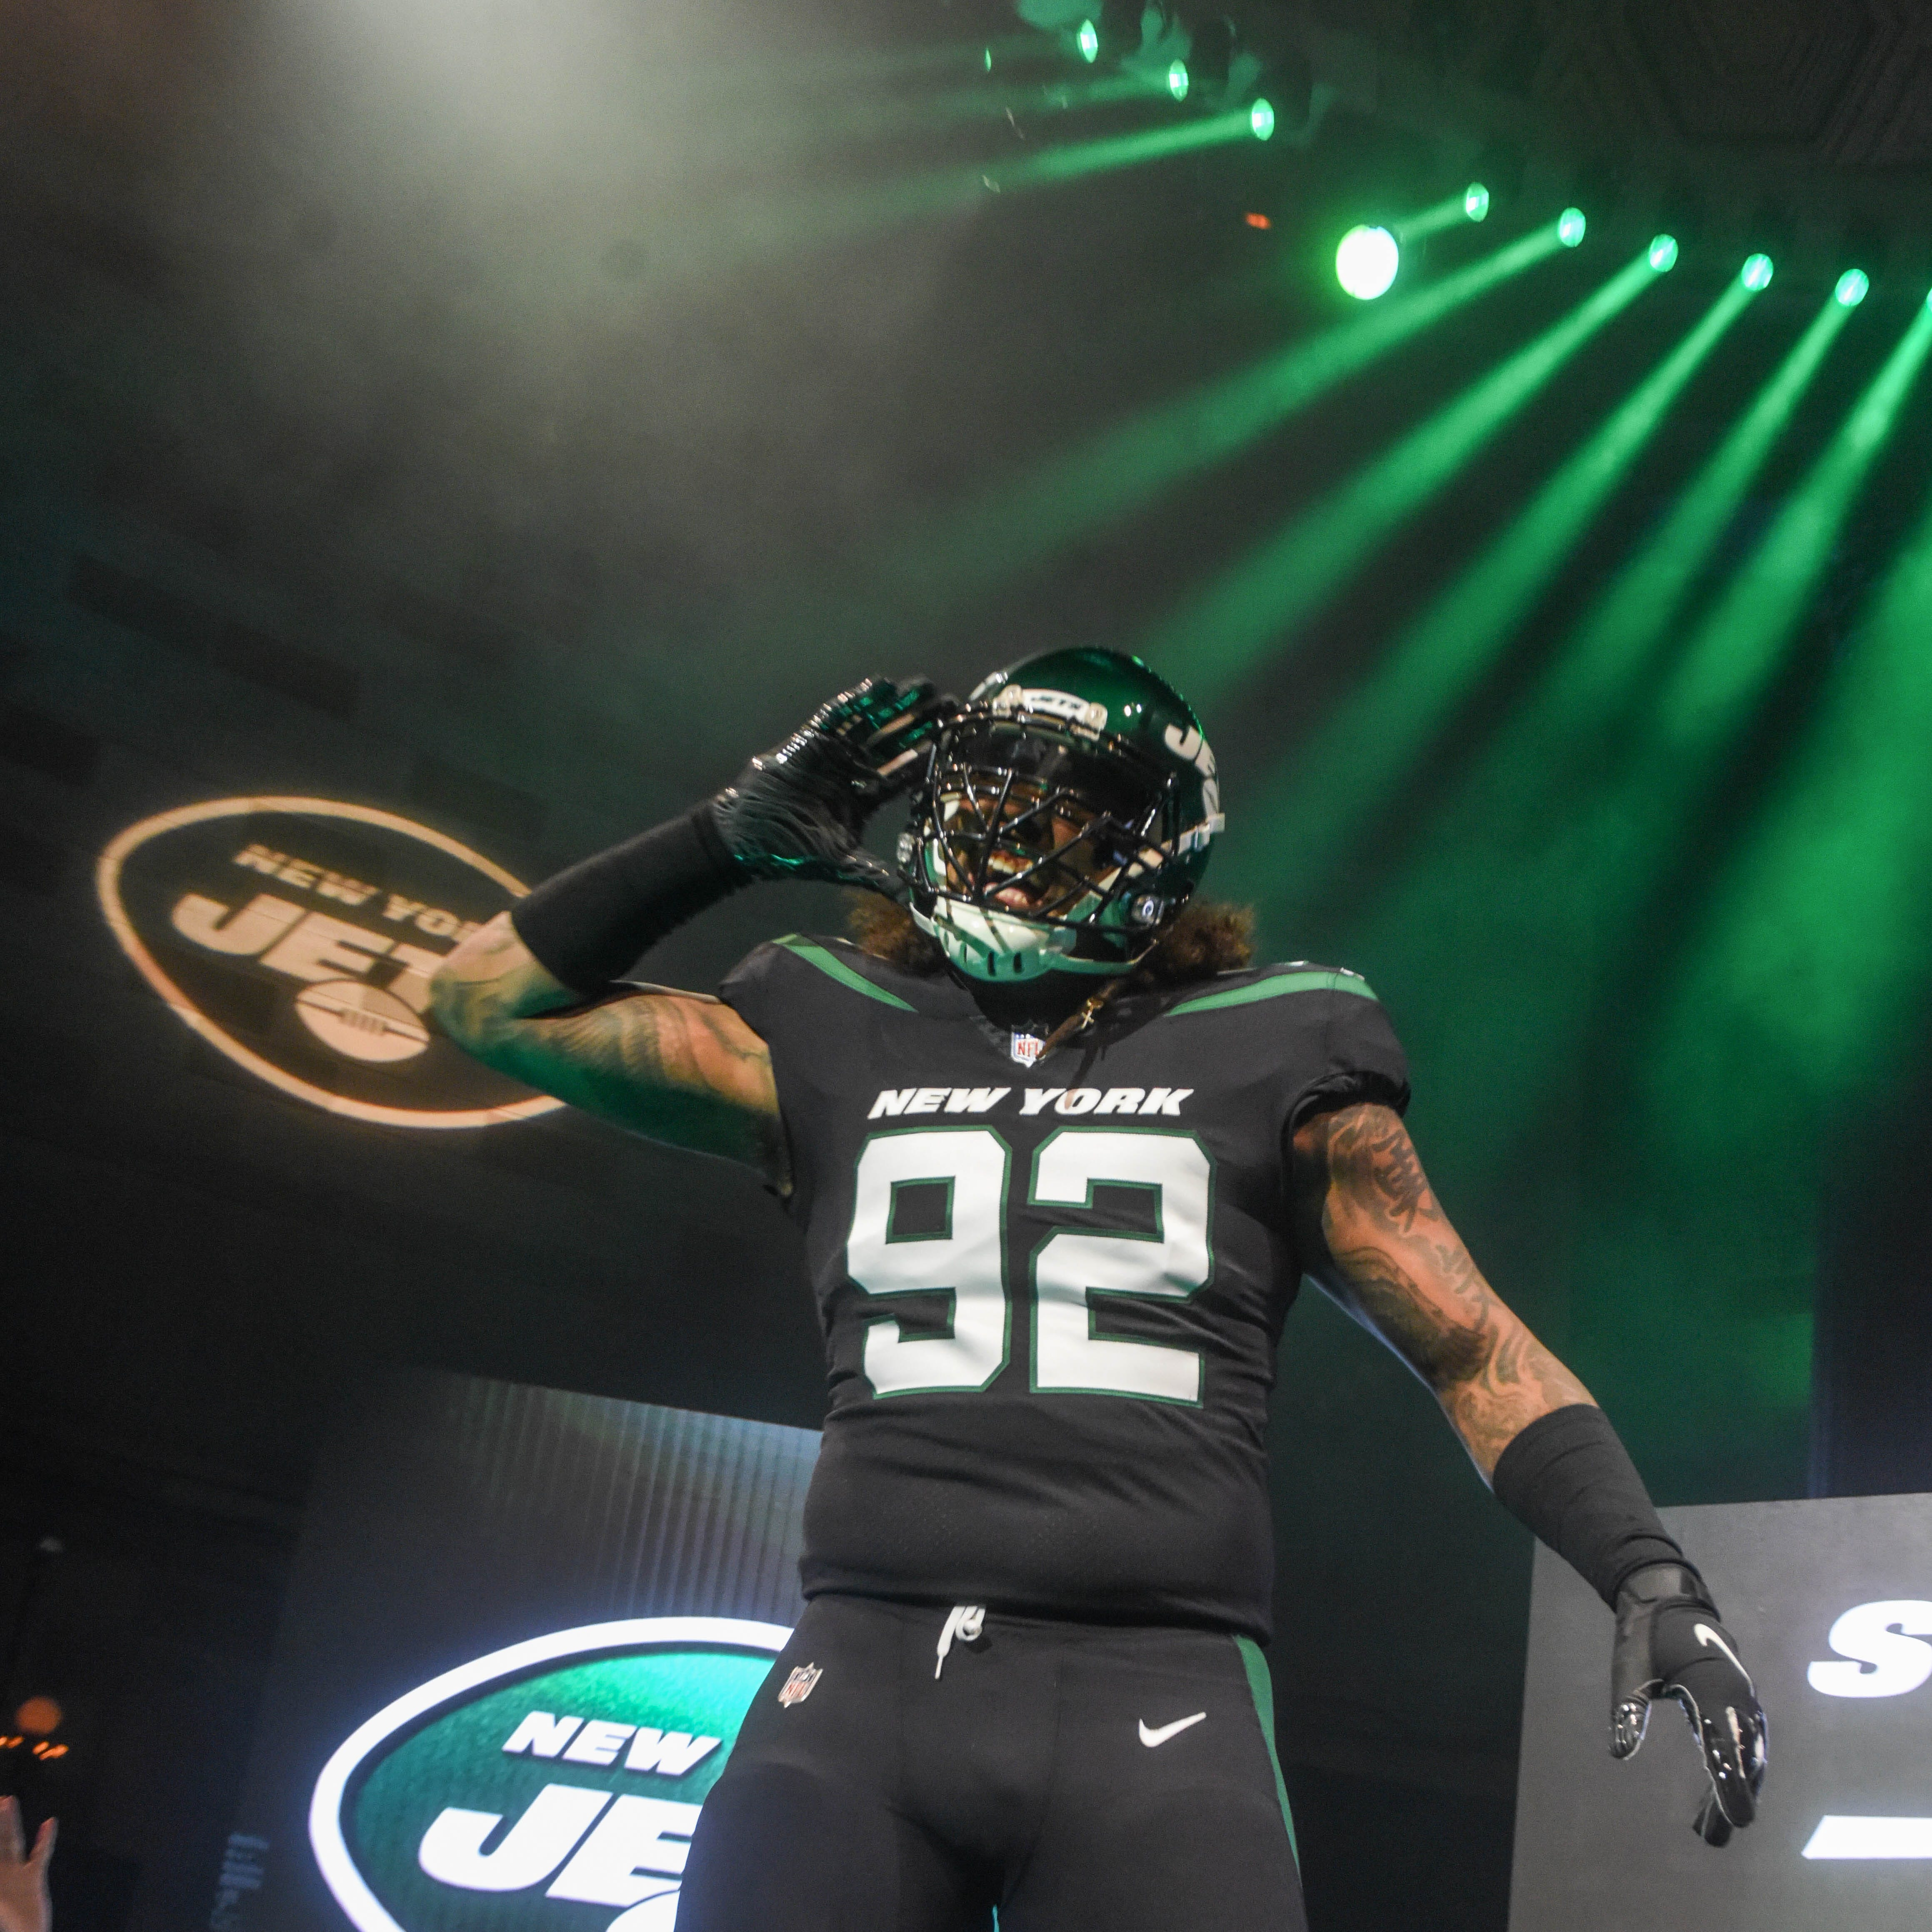 NFL uniforms: Ranking each team's look for 2019 season